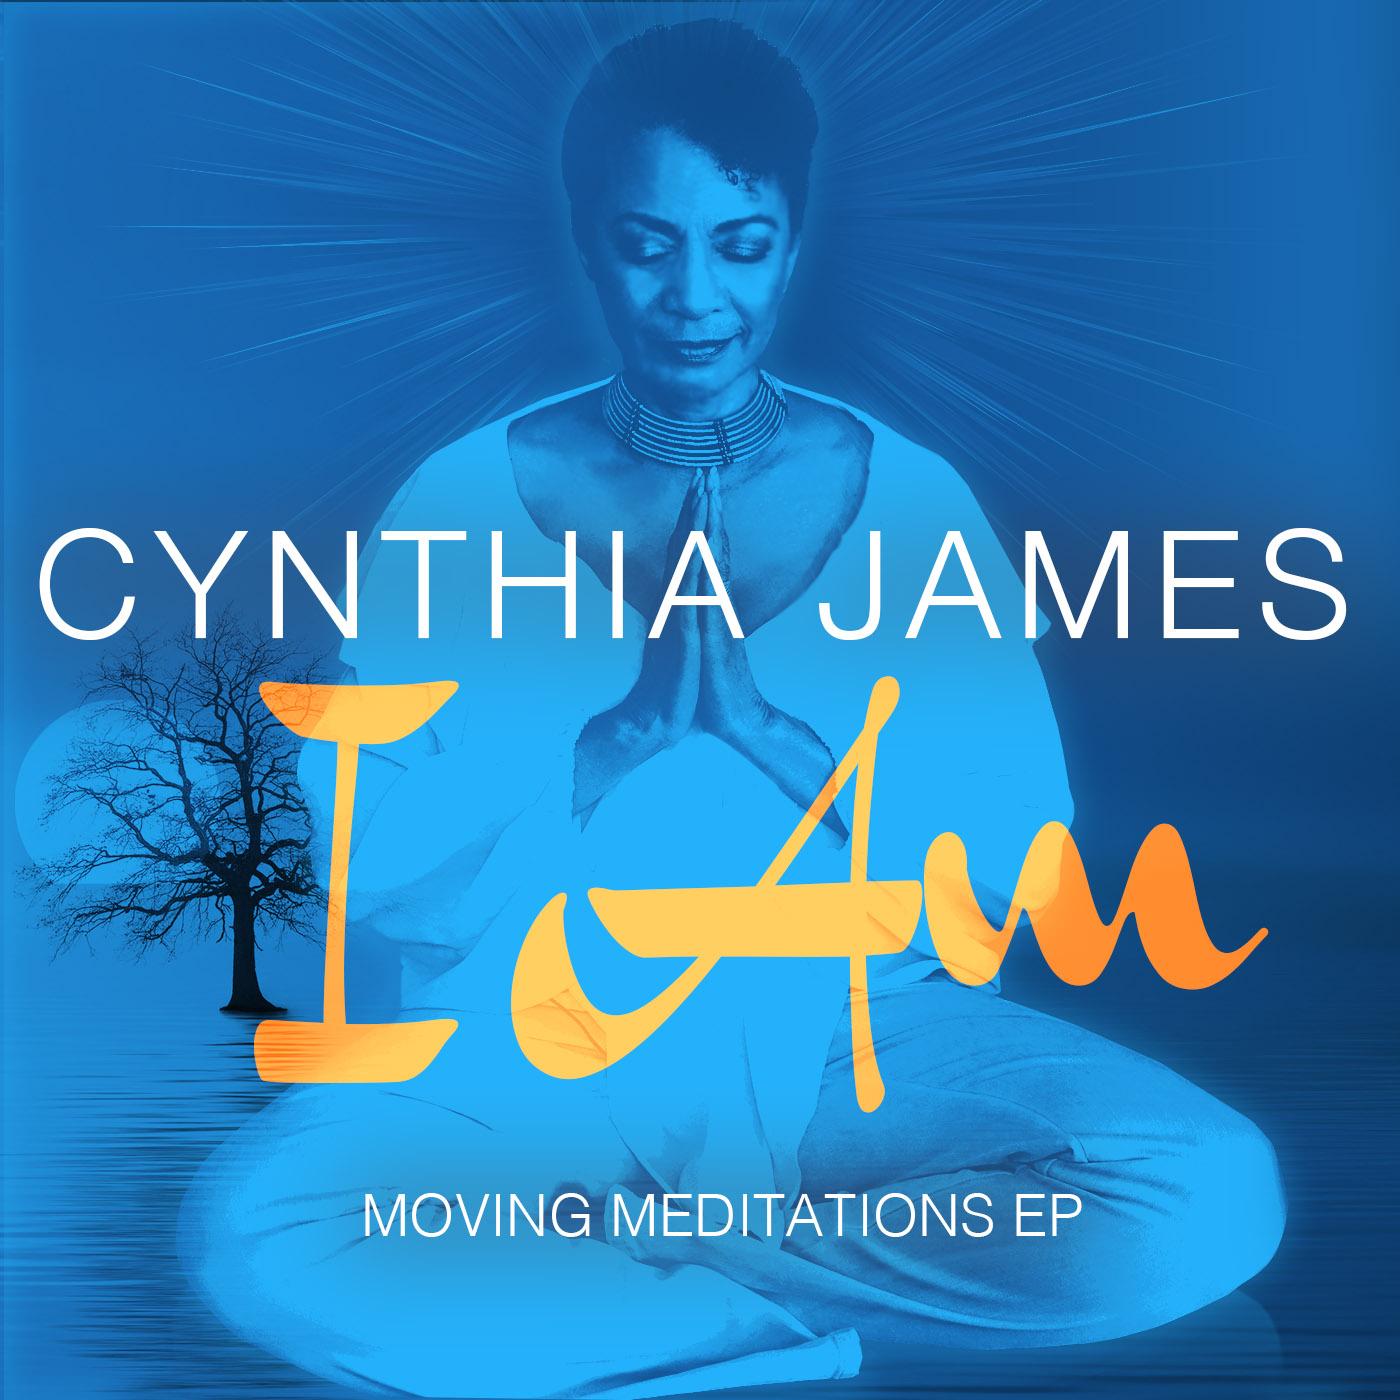 Cynthiajames-IAM-itunes-EPcover-final